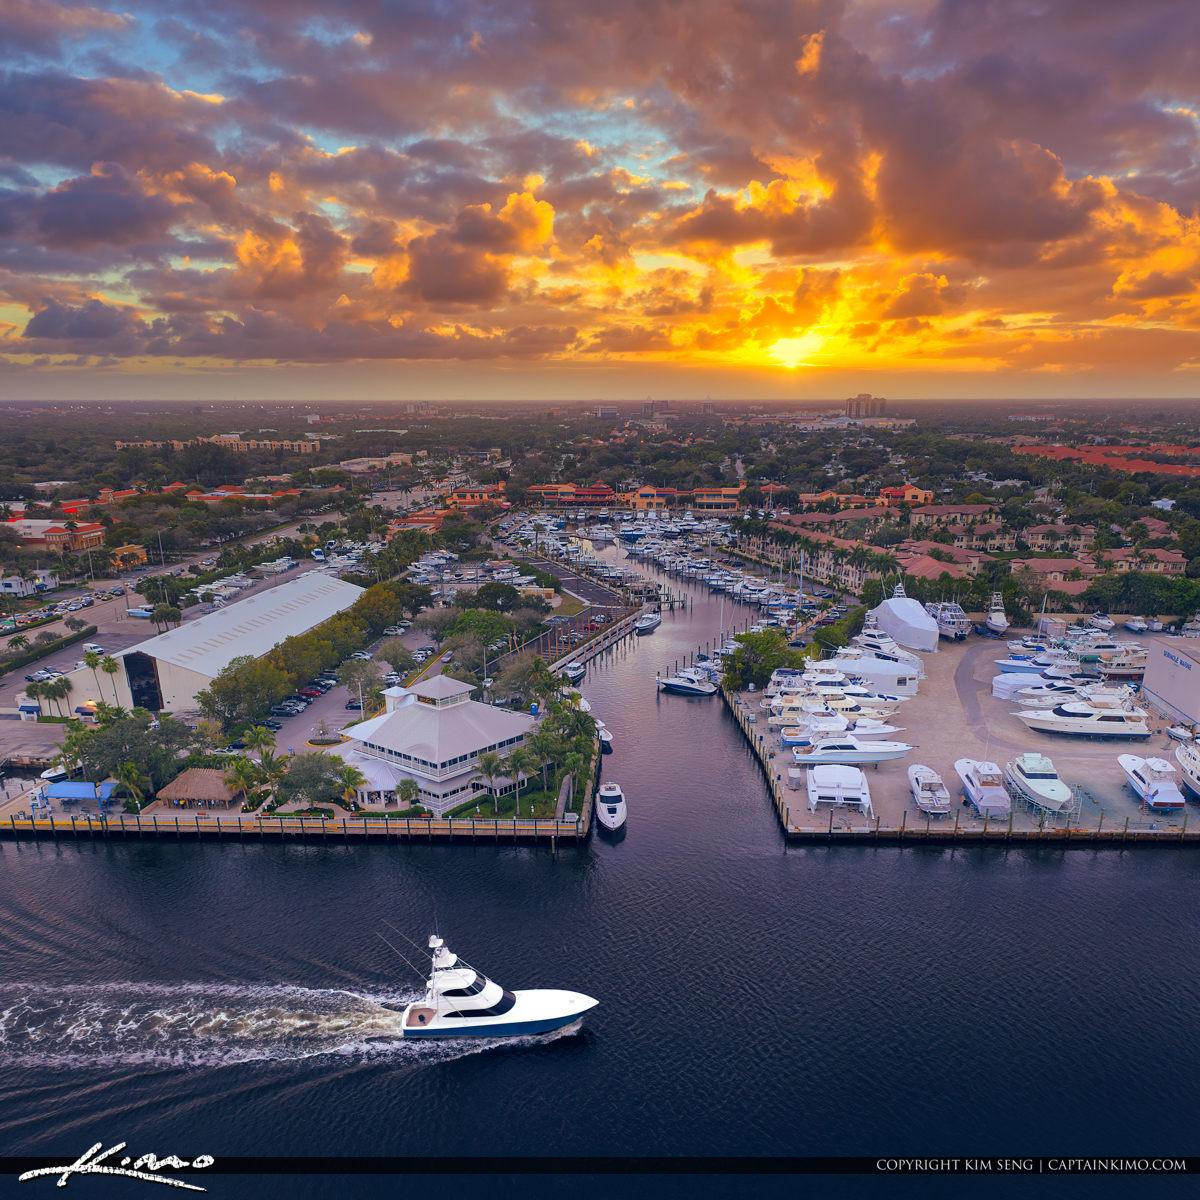 Palm Beach Gardens Marina Sunset with Yacht Along the Waterway